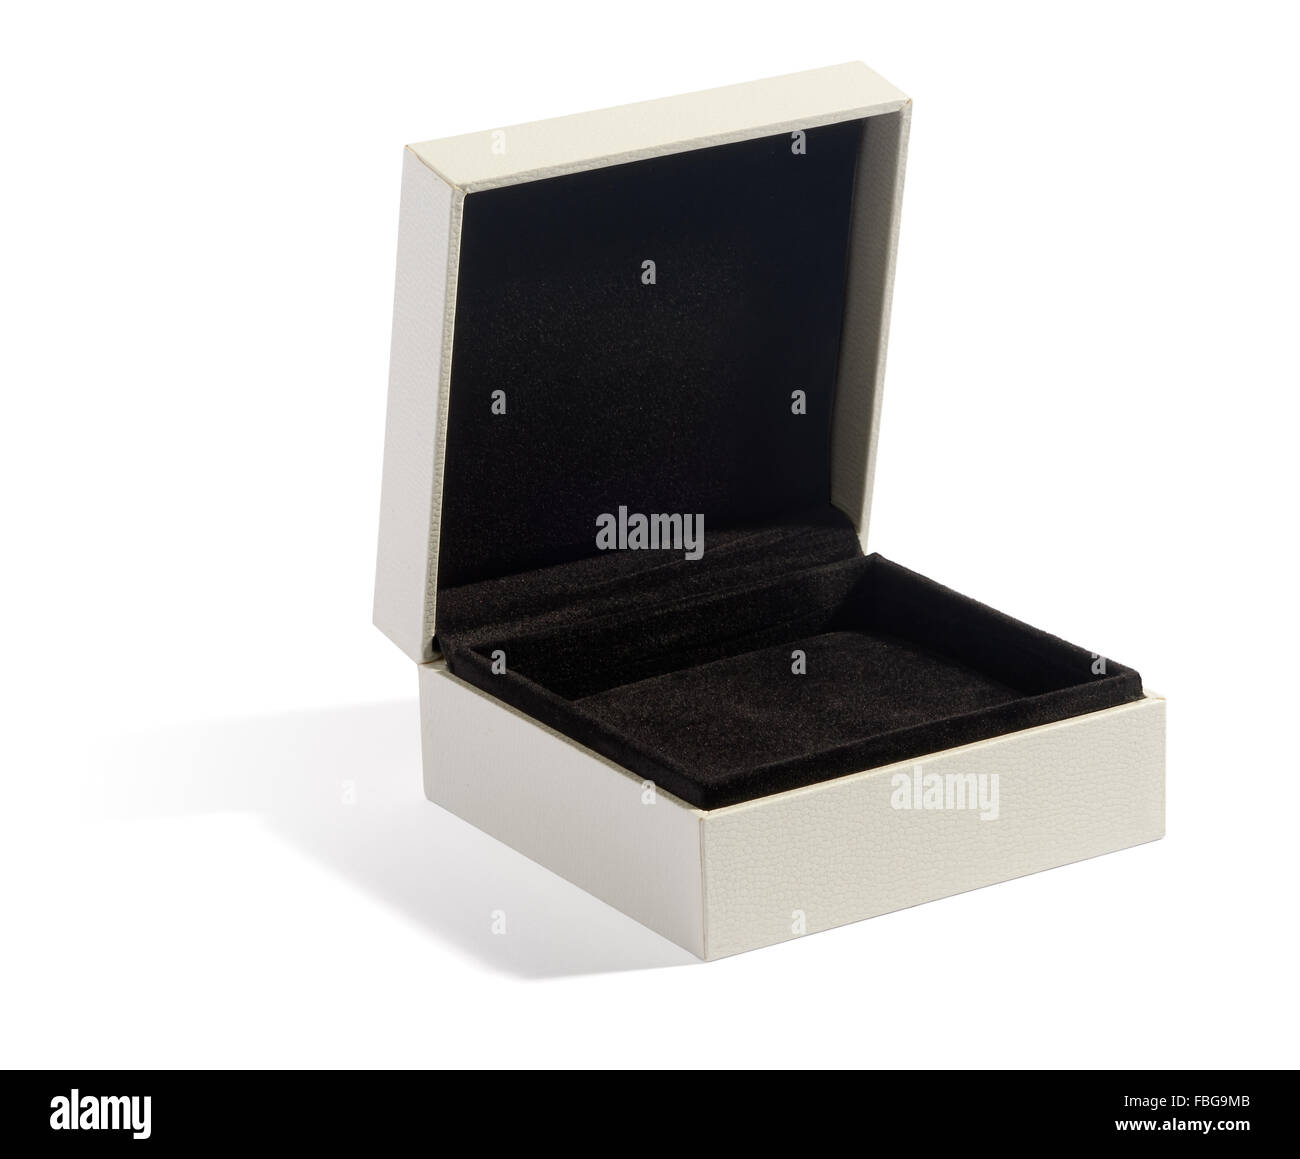 Single wide open jewelry box with black felt padding on white background - Stock Image